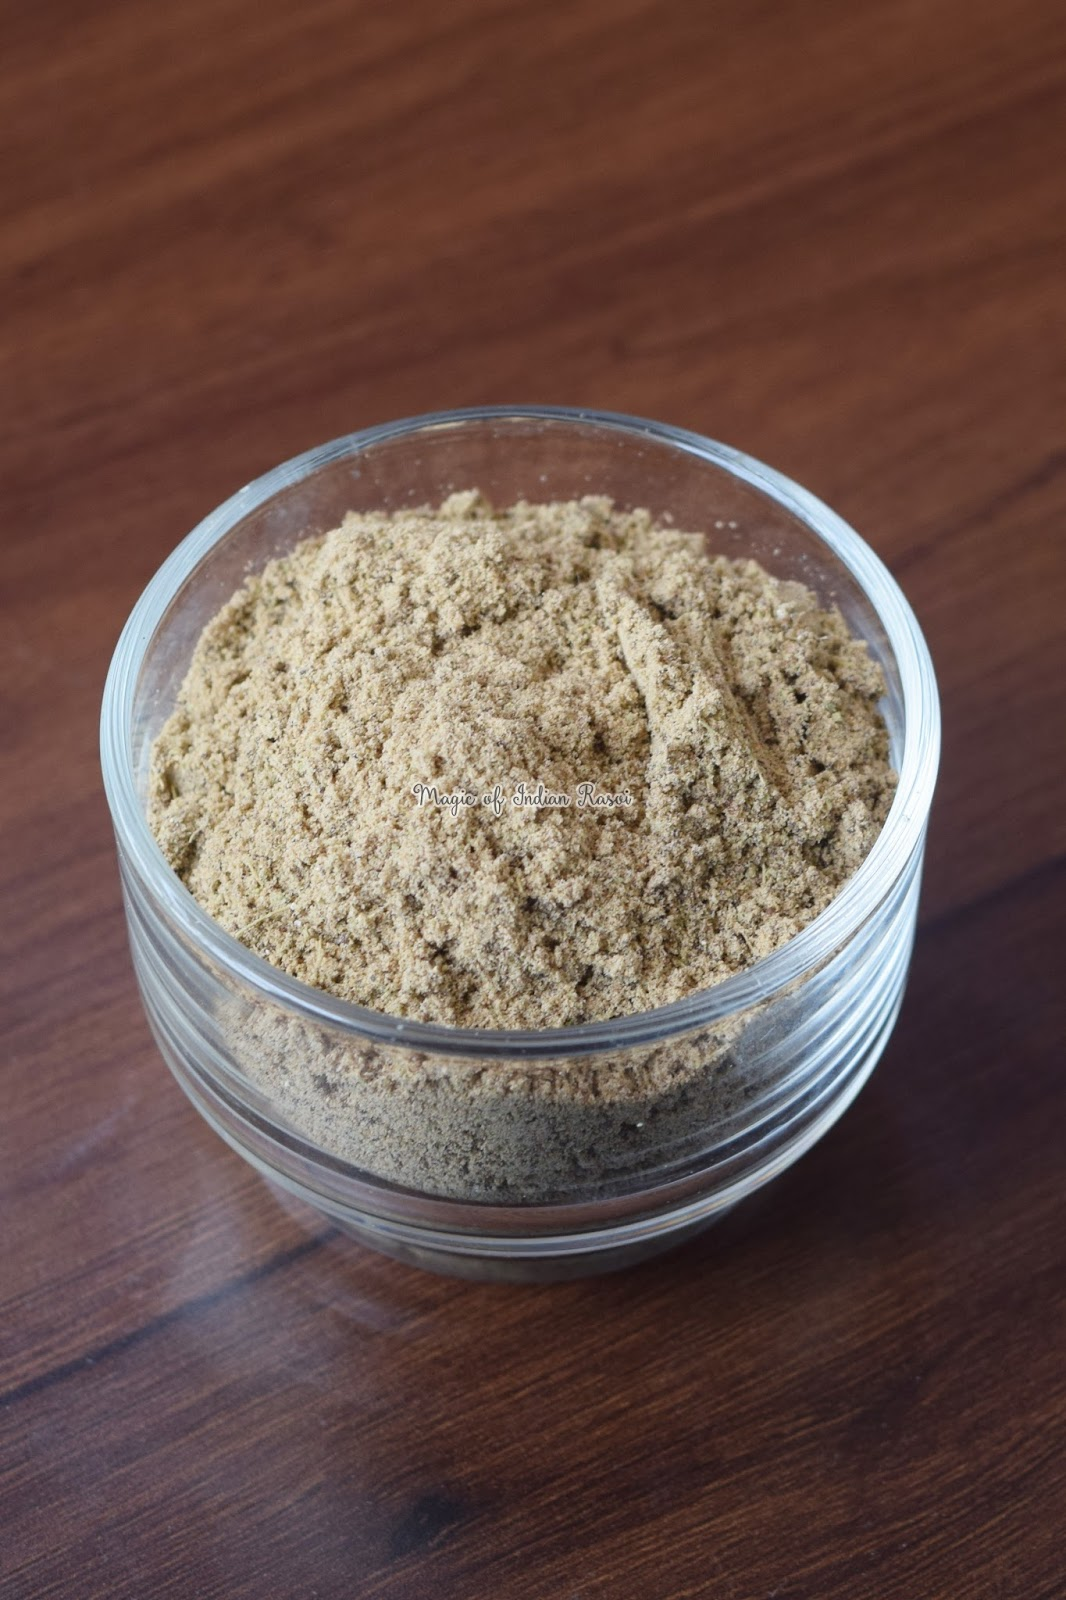 Tea Masala - Homemade Indian Chai Masala Powder Recipe - टी मसाला - होममेड इंडियन चाय मसाला पाउडर रेसिपी - Priya R - Magic of Indian Rasoi